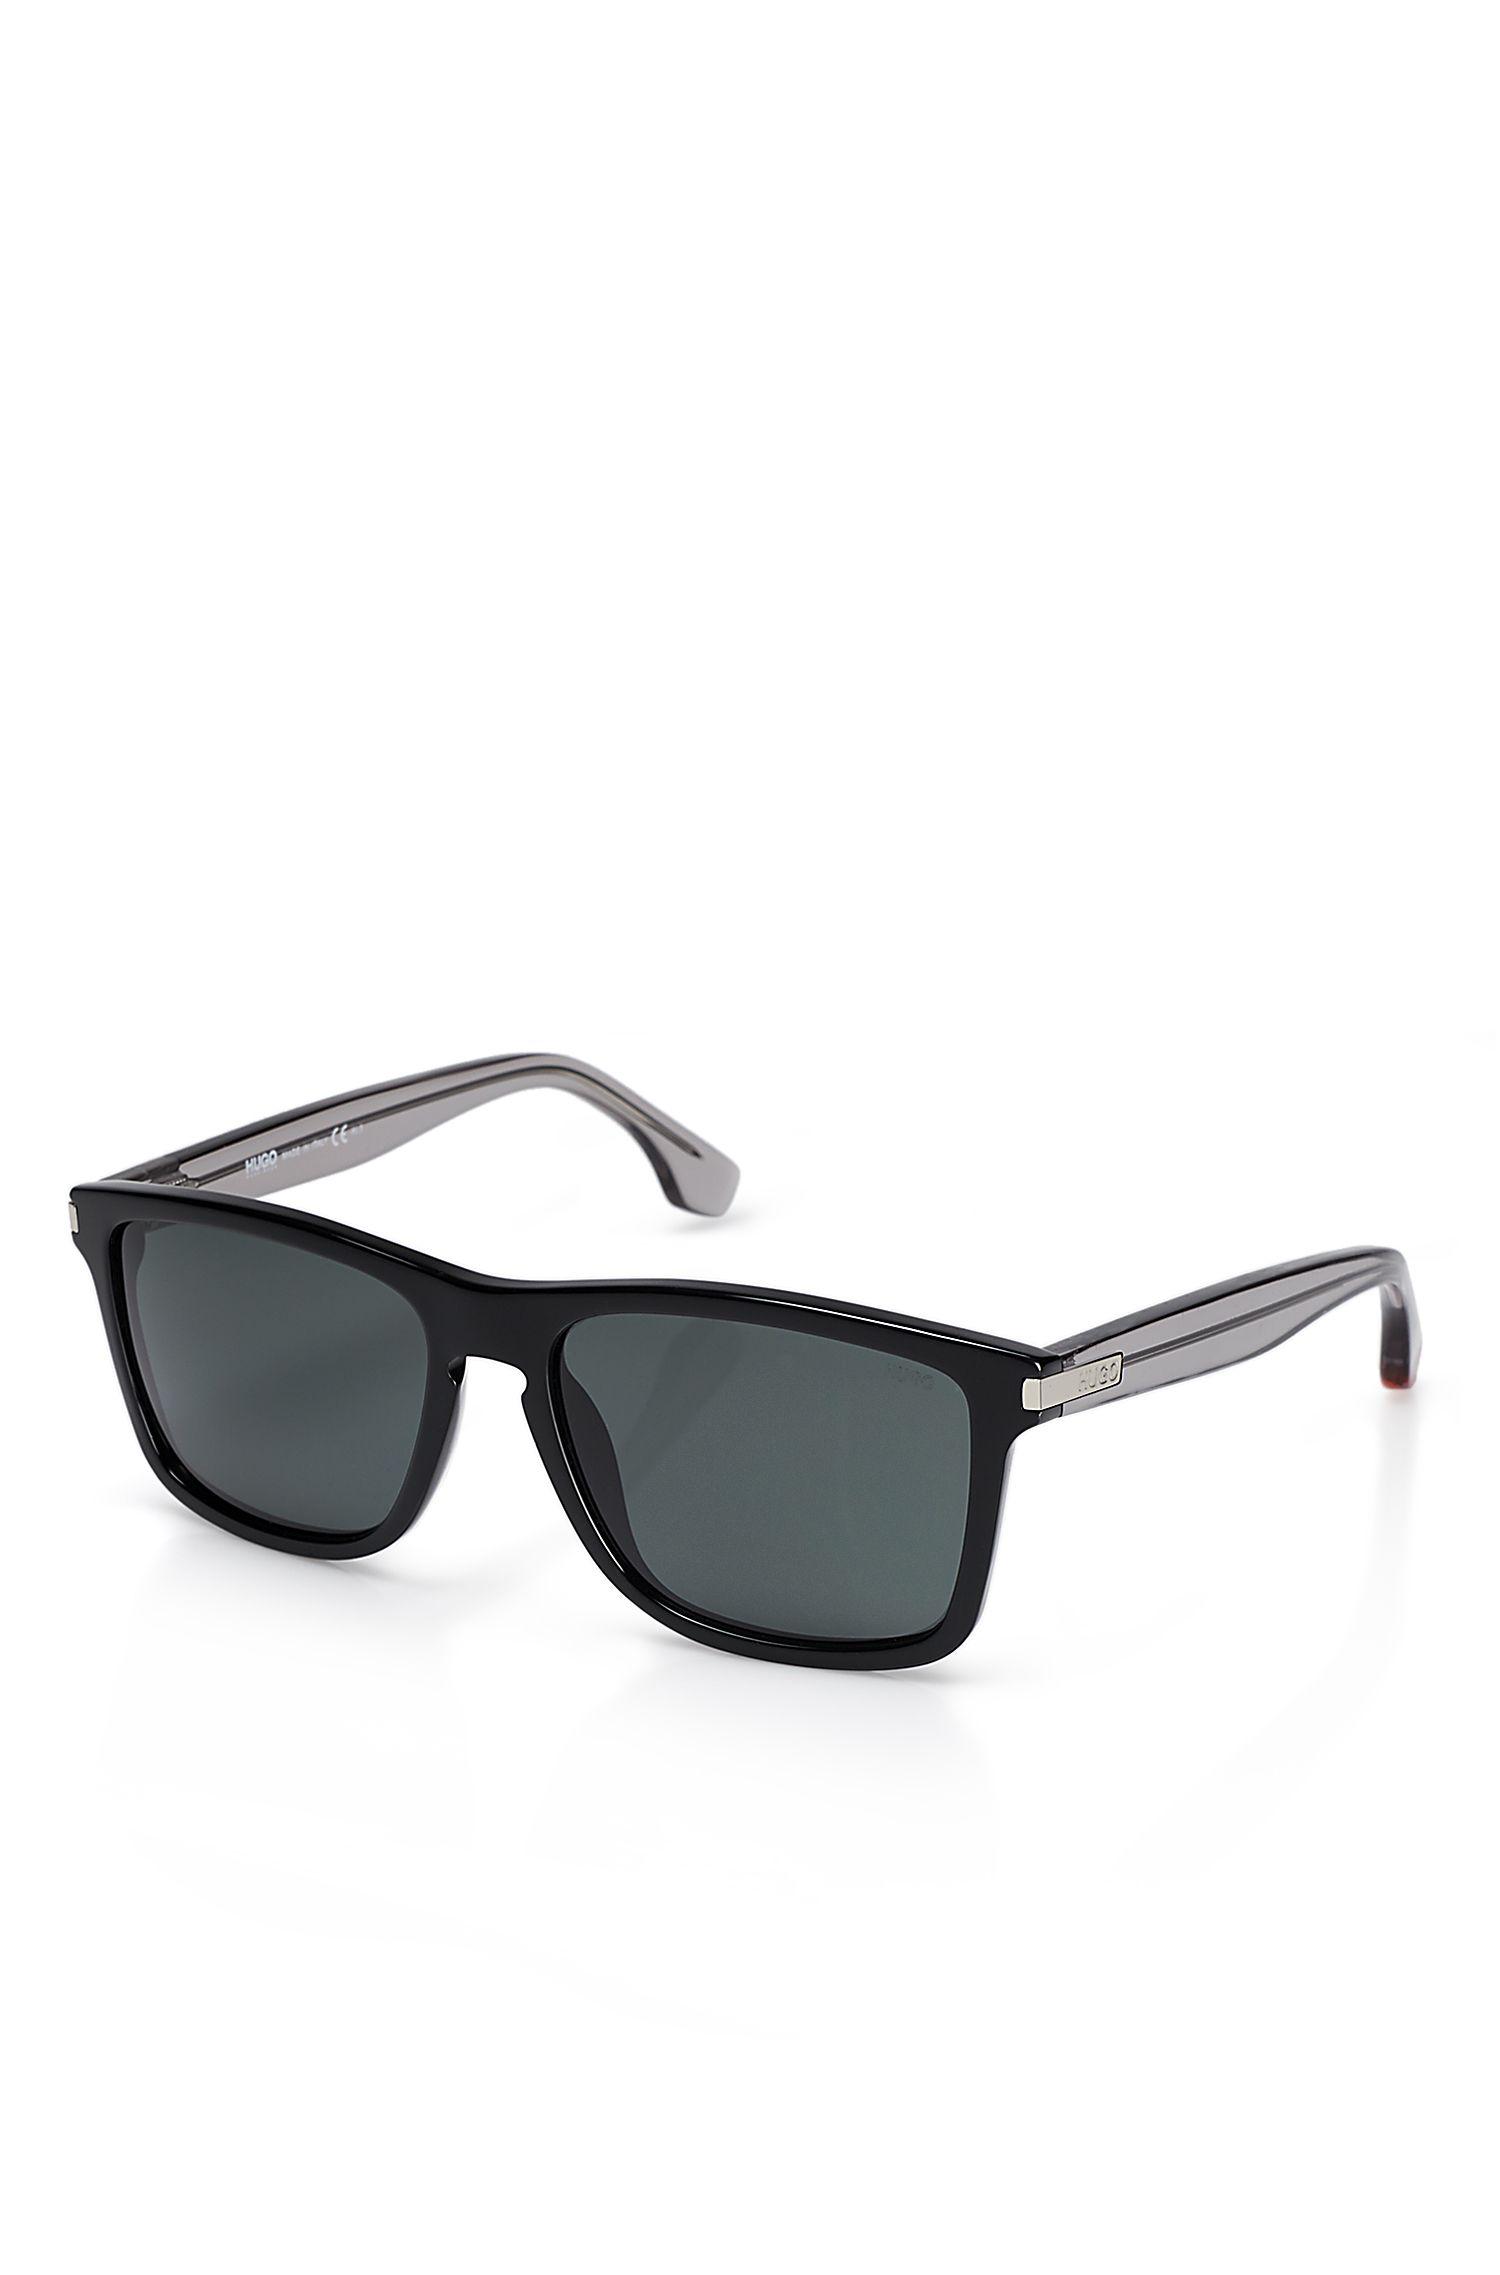 'Sunglasses'   Solid Black Frame Sunglasses